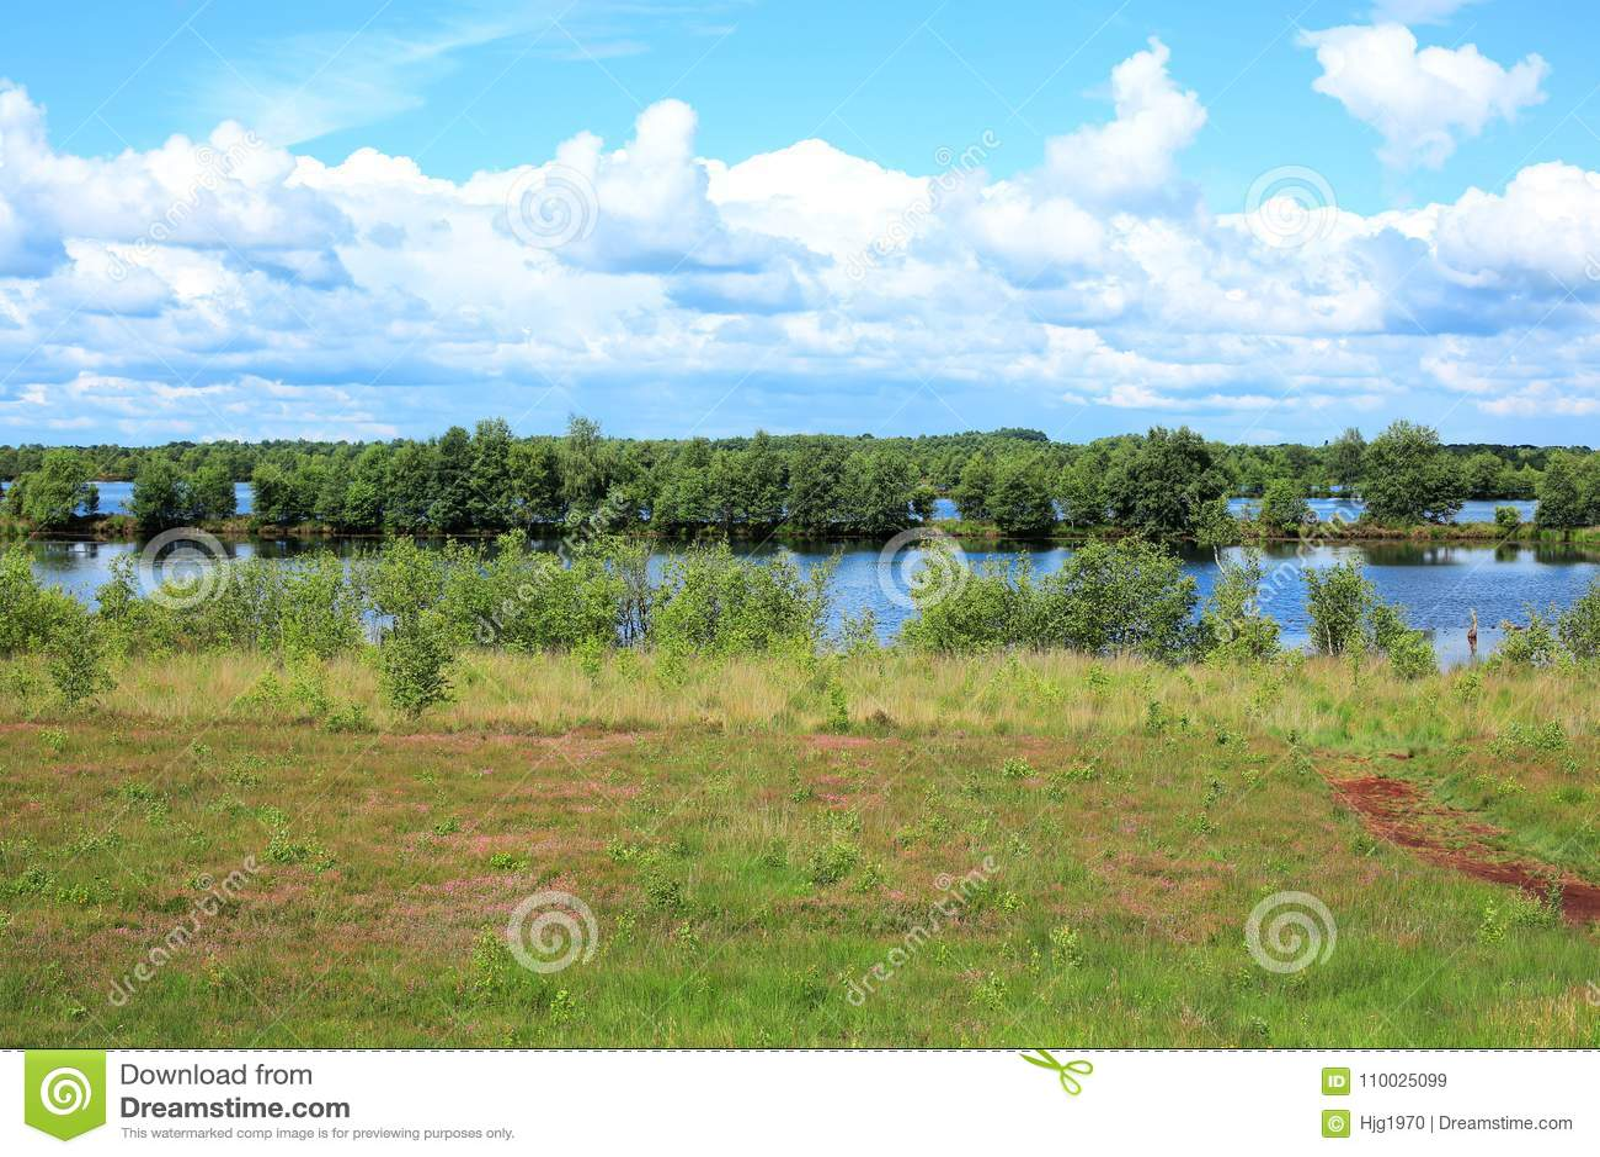 Leg landschap in Emsland, Nedersaksen, Duitsland vast